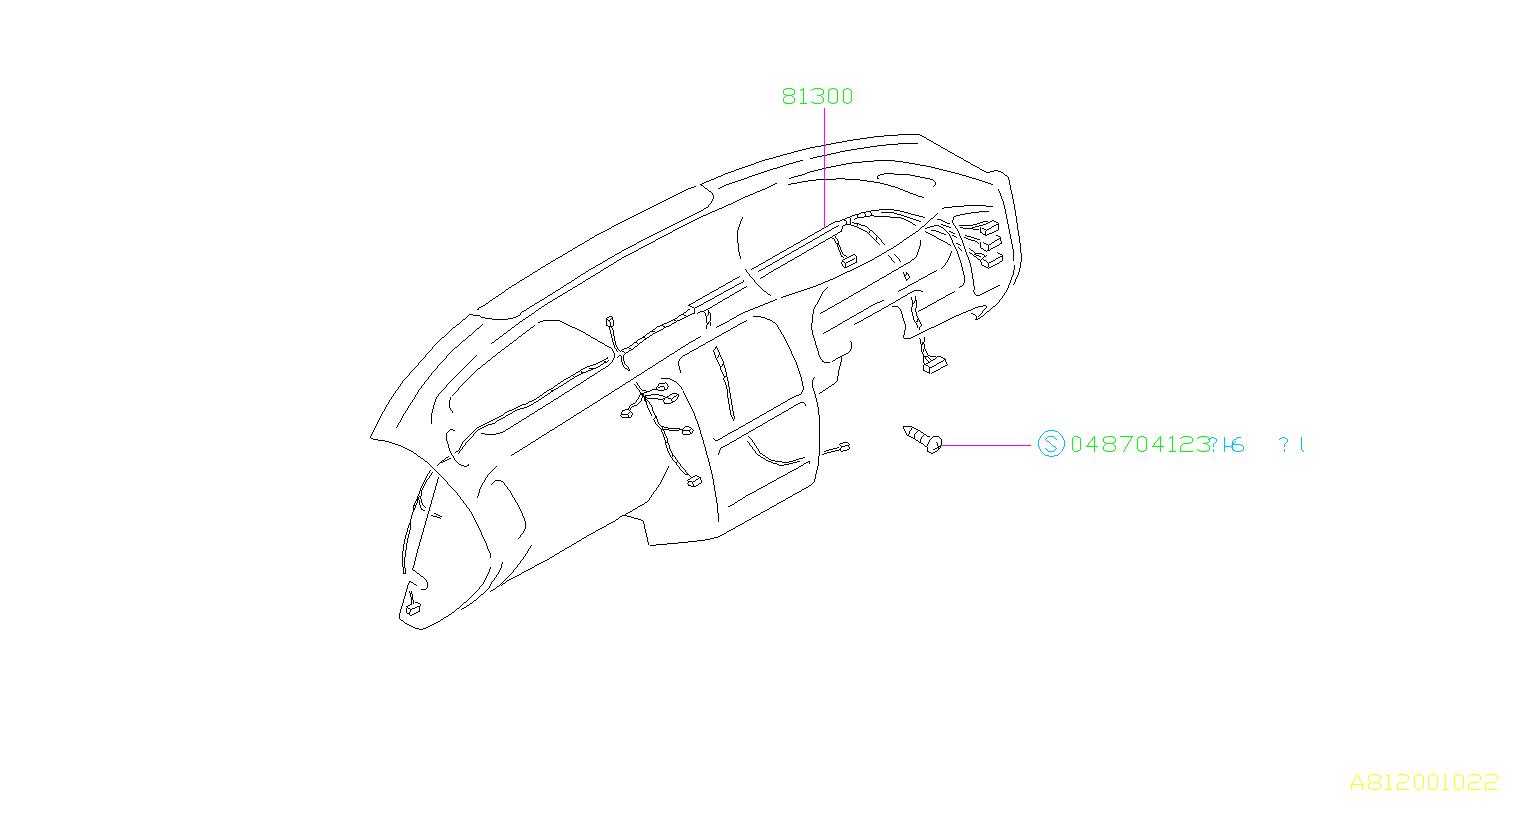 Subaru Legacy Harness Instrument Panel Out Back U0u1